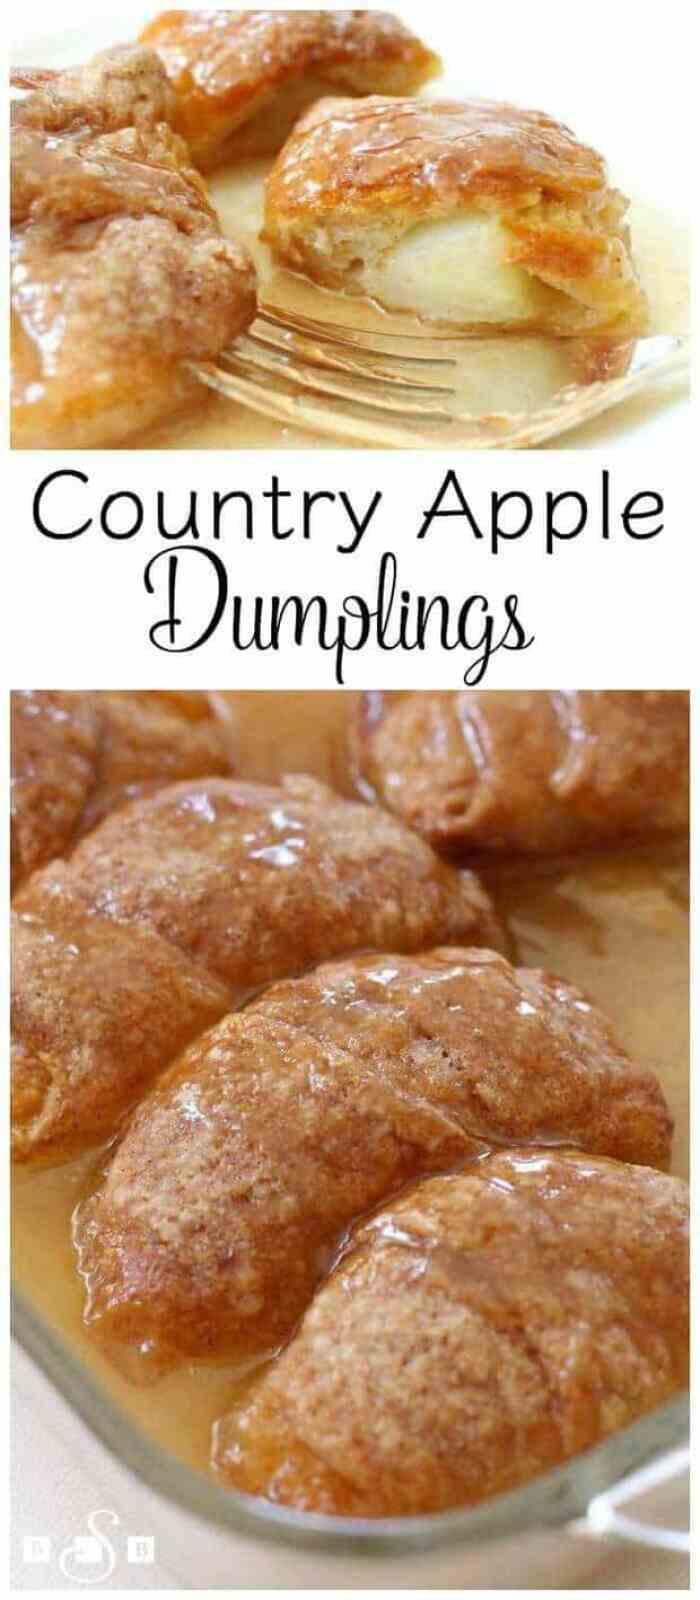 http://www.butterwithasideofbread.com/2012/08/country-apple-dumplings/